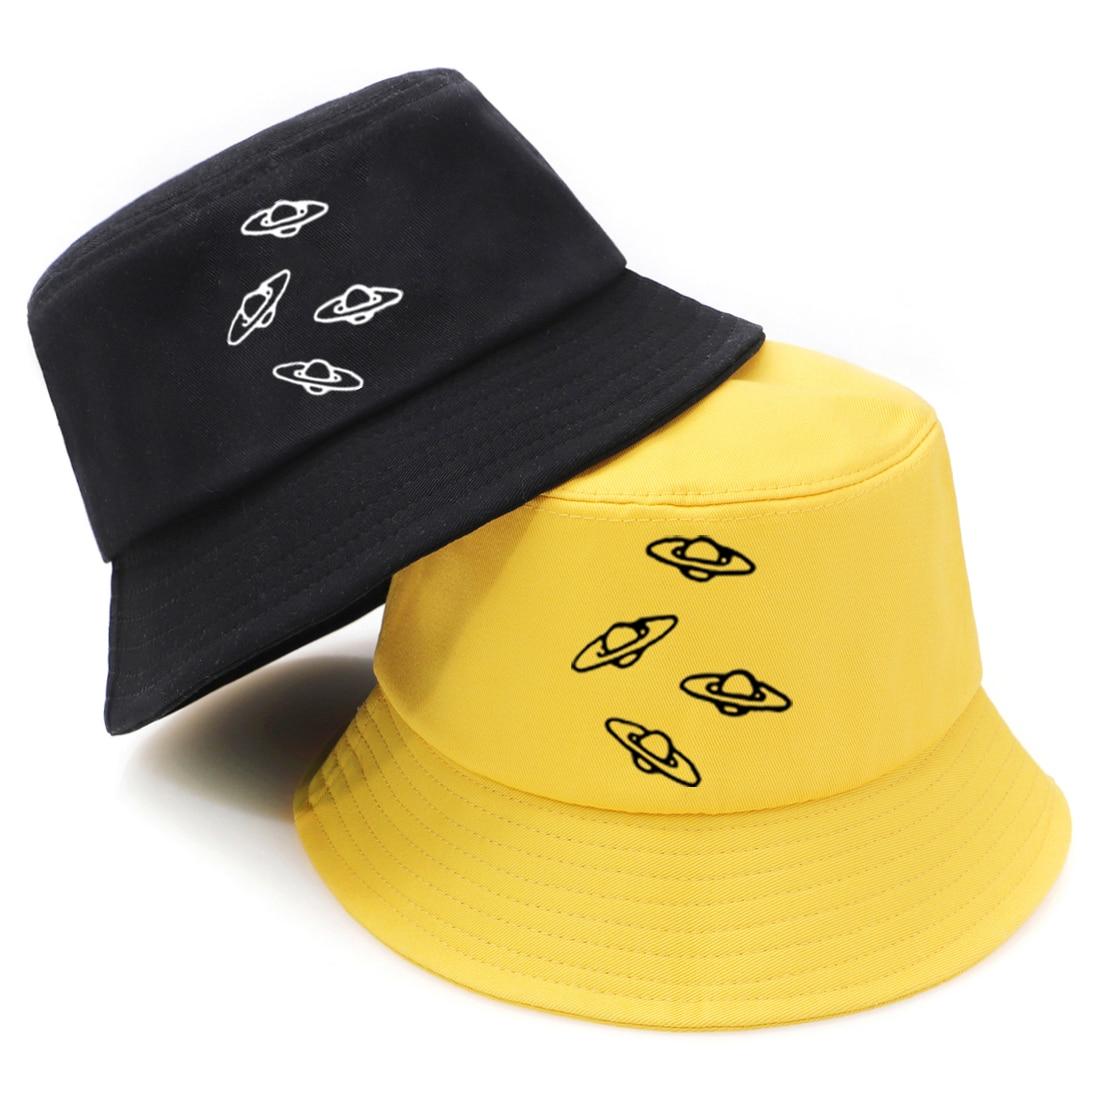 Spaceship hop pesca caça chapéus chapéu de balde protetor solar de rua panamá dobrável casual 2020 chapeu pescador